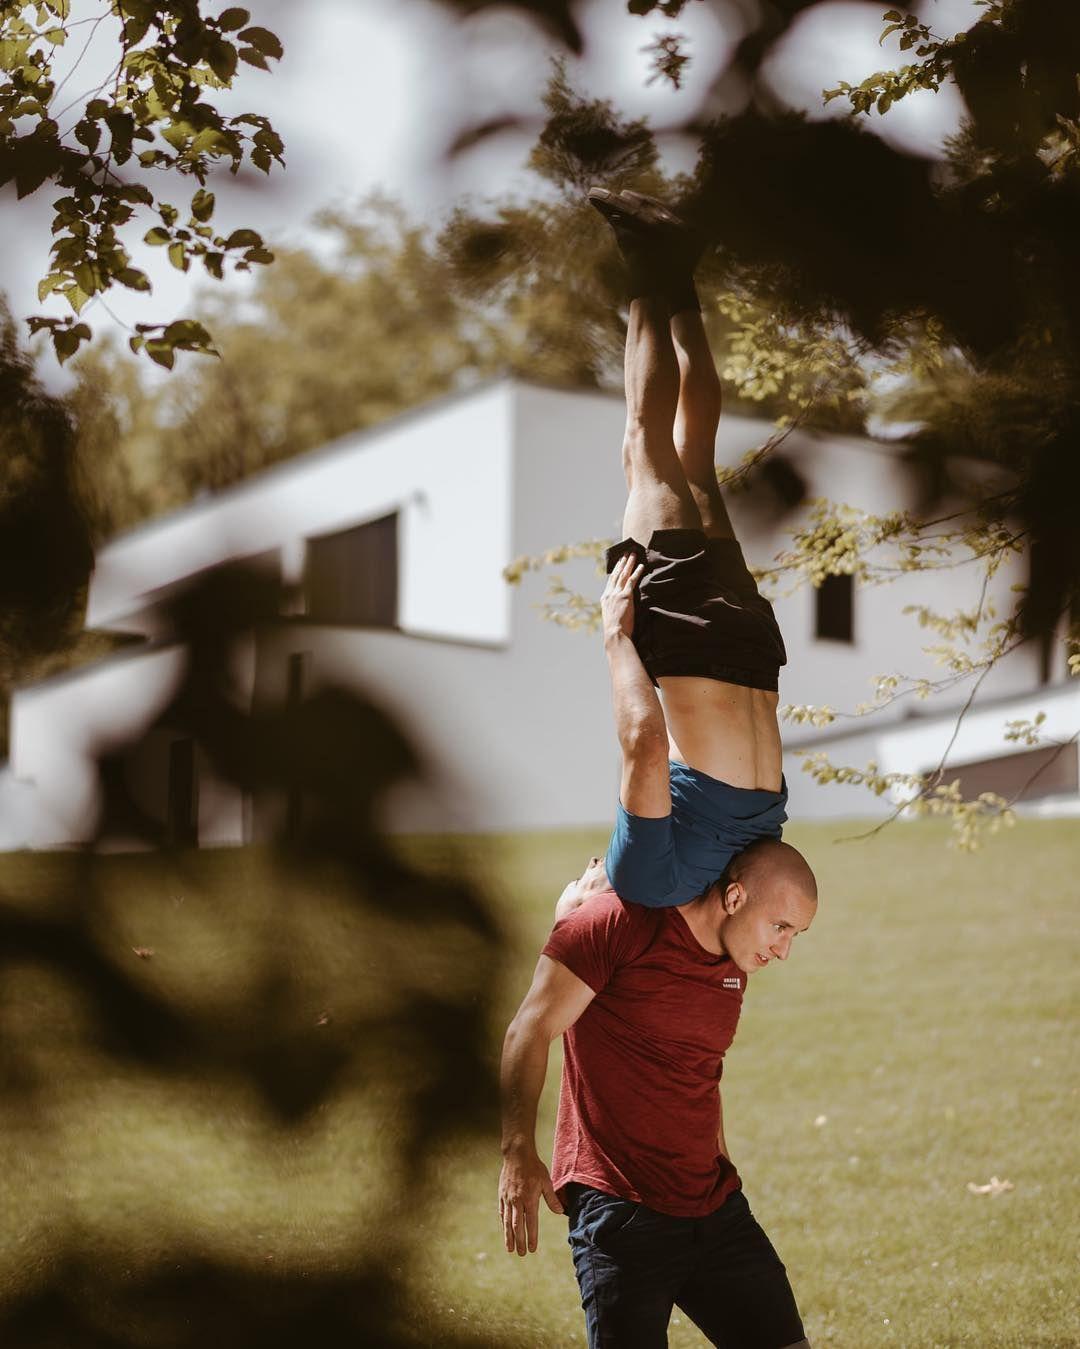 undefined Acrobatics, Instagram, Acro